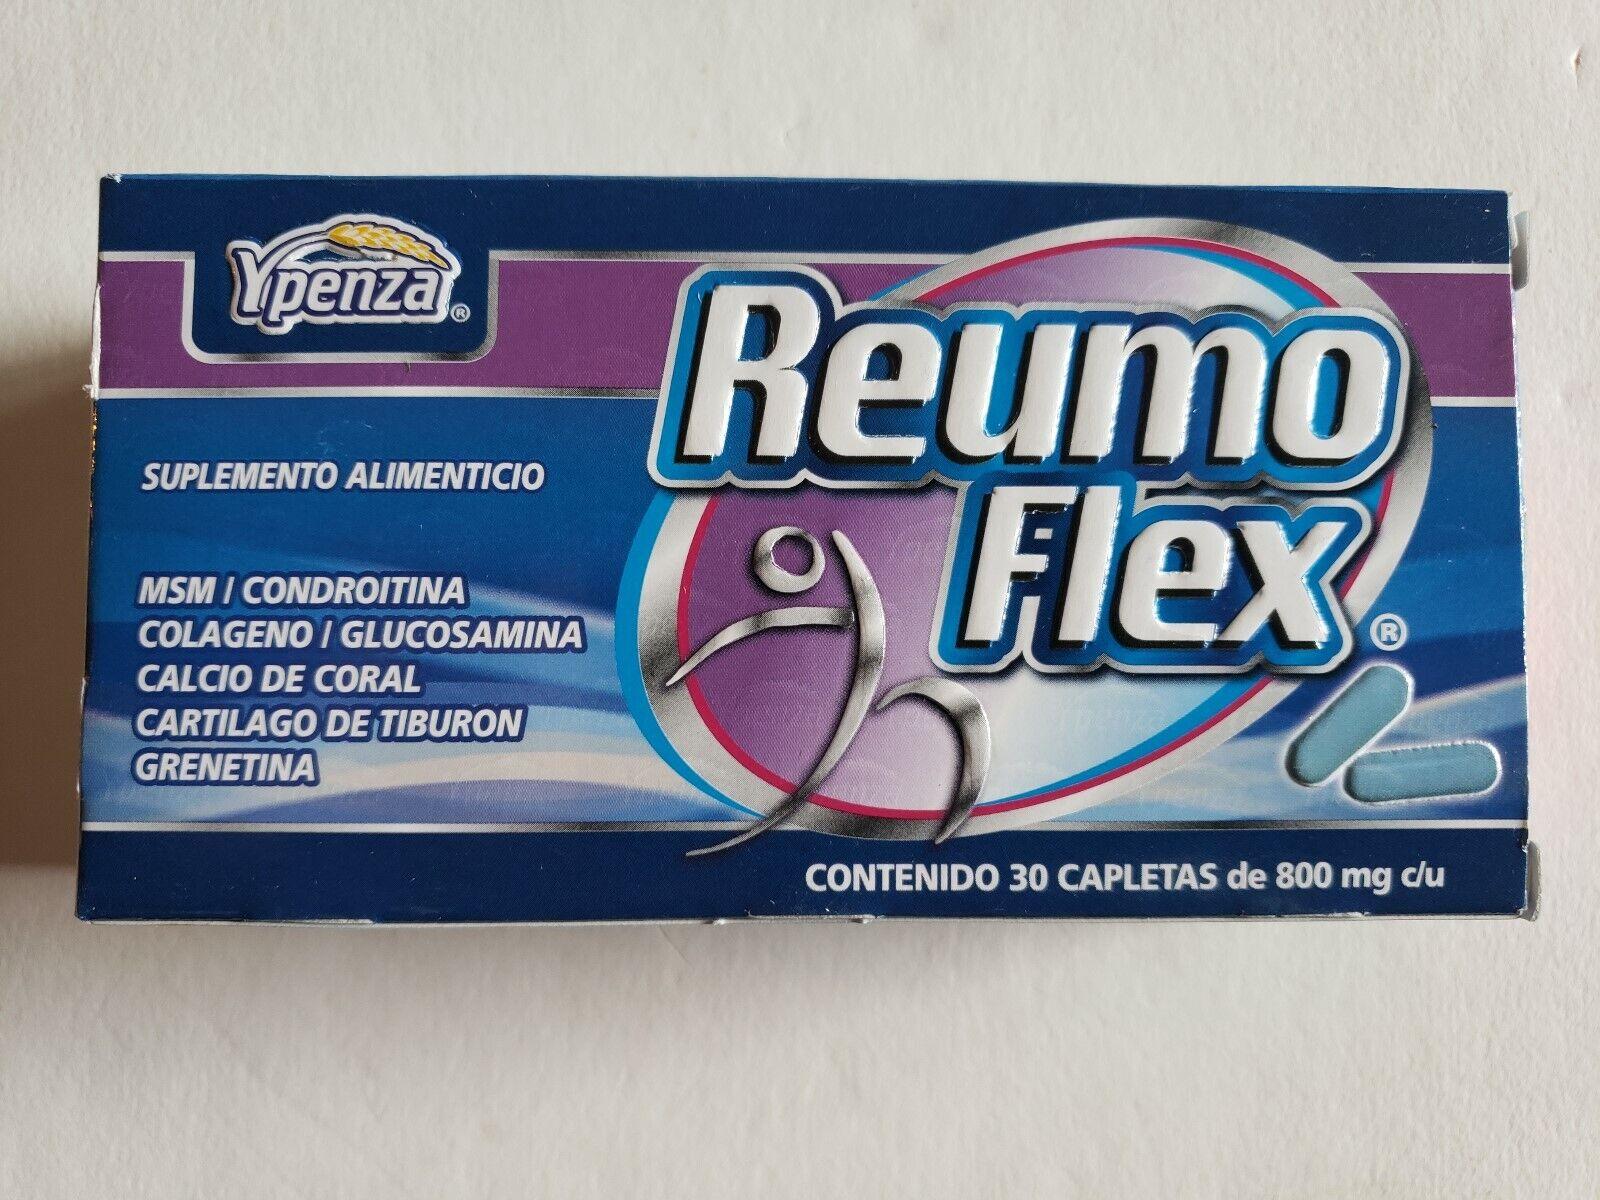 YPENZAR REUMO FLEX RELIEVE JOITS ARTHRITIS AND CIATICA PAIN ARTICULACIONES